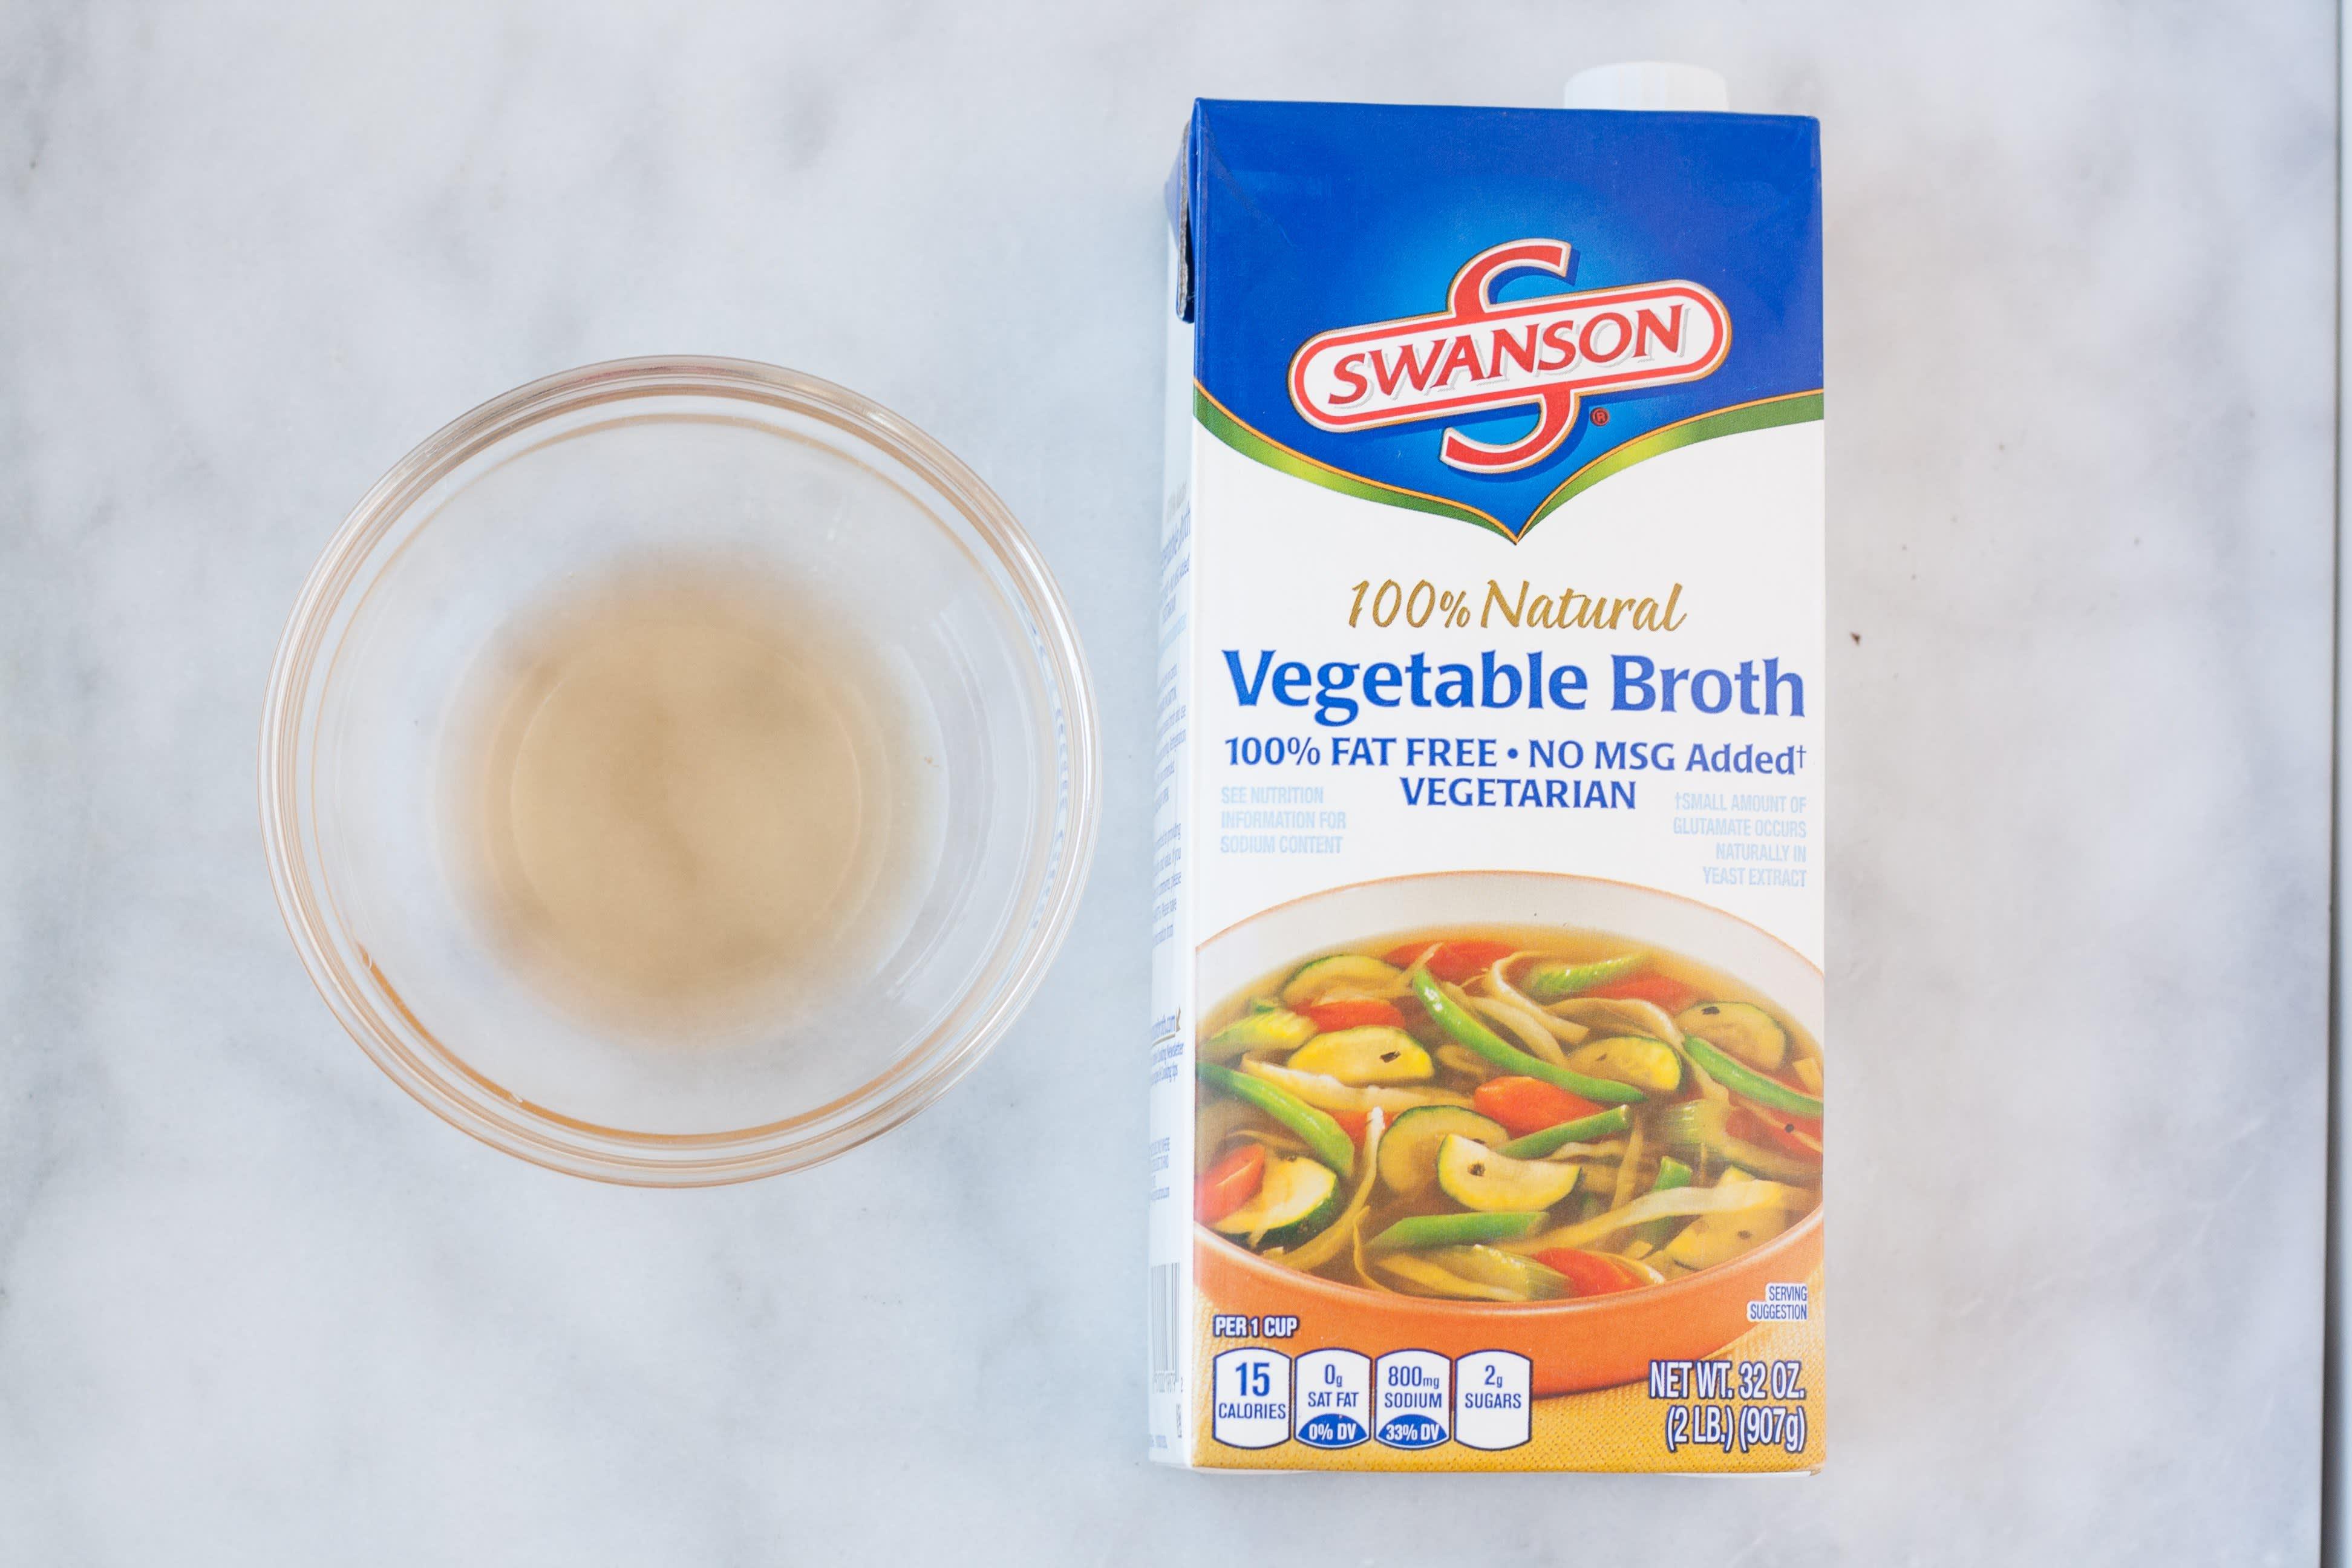 Swanson's Vegetable Broth